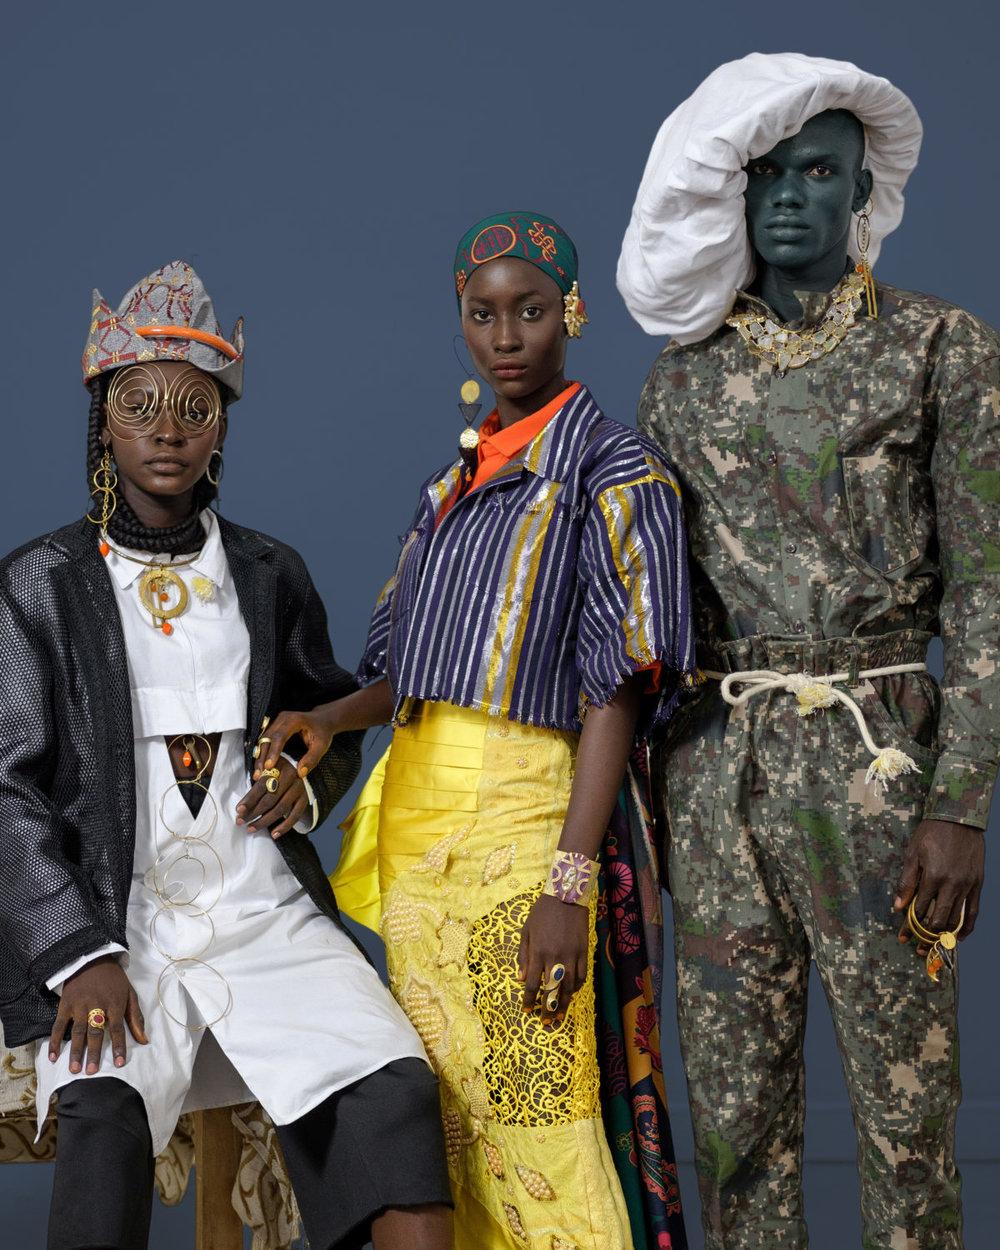 Lagos Futurism by Photographer William Ukoh featuring fashion brands Orange Culture, Andrea Iyamah, Fruche Iamisigo, Raya, Maxivive, Ladunni Lambo.jpg